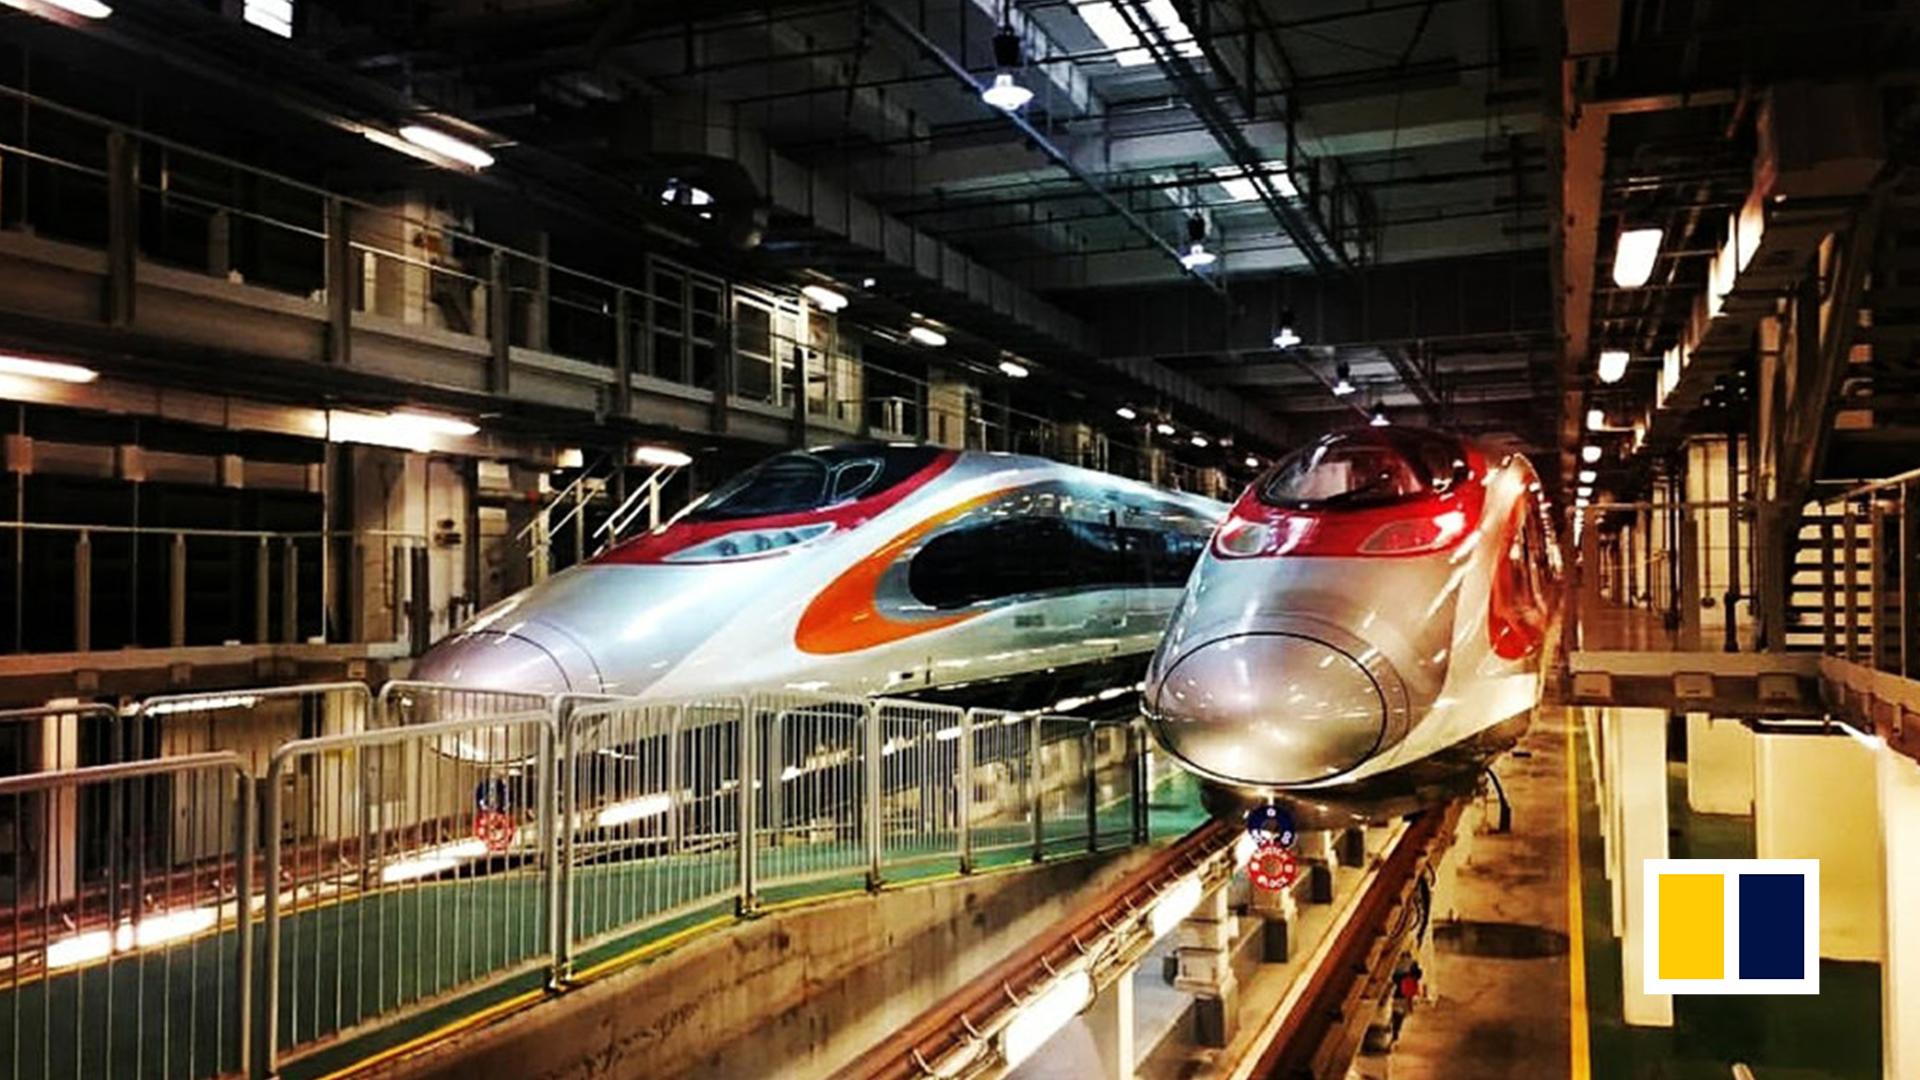 Hong Kong's new high-speed rail link to mainland China